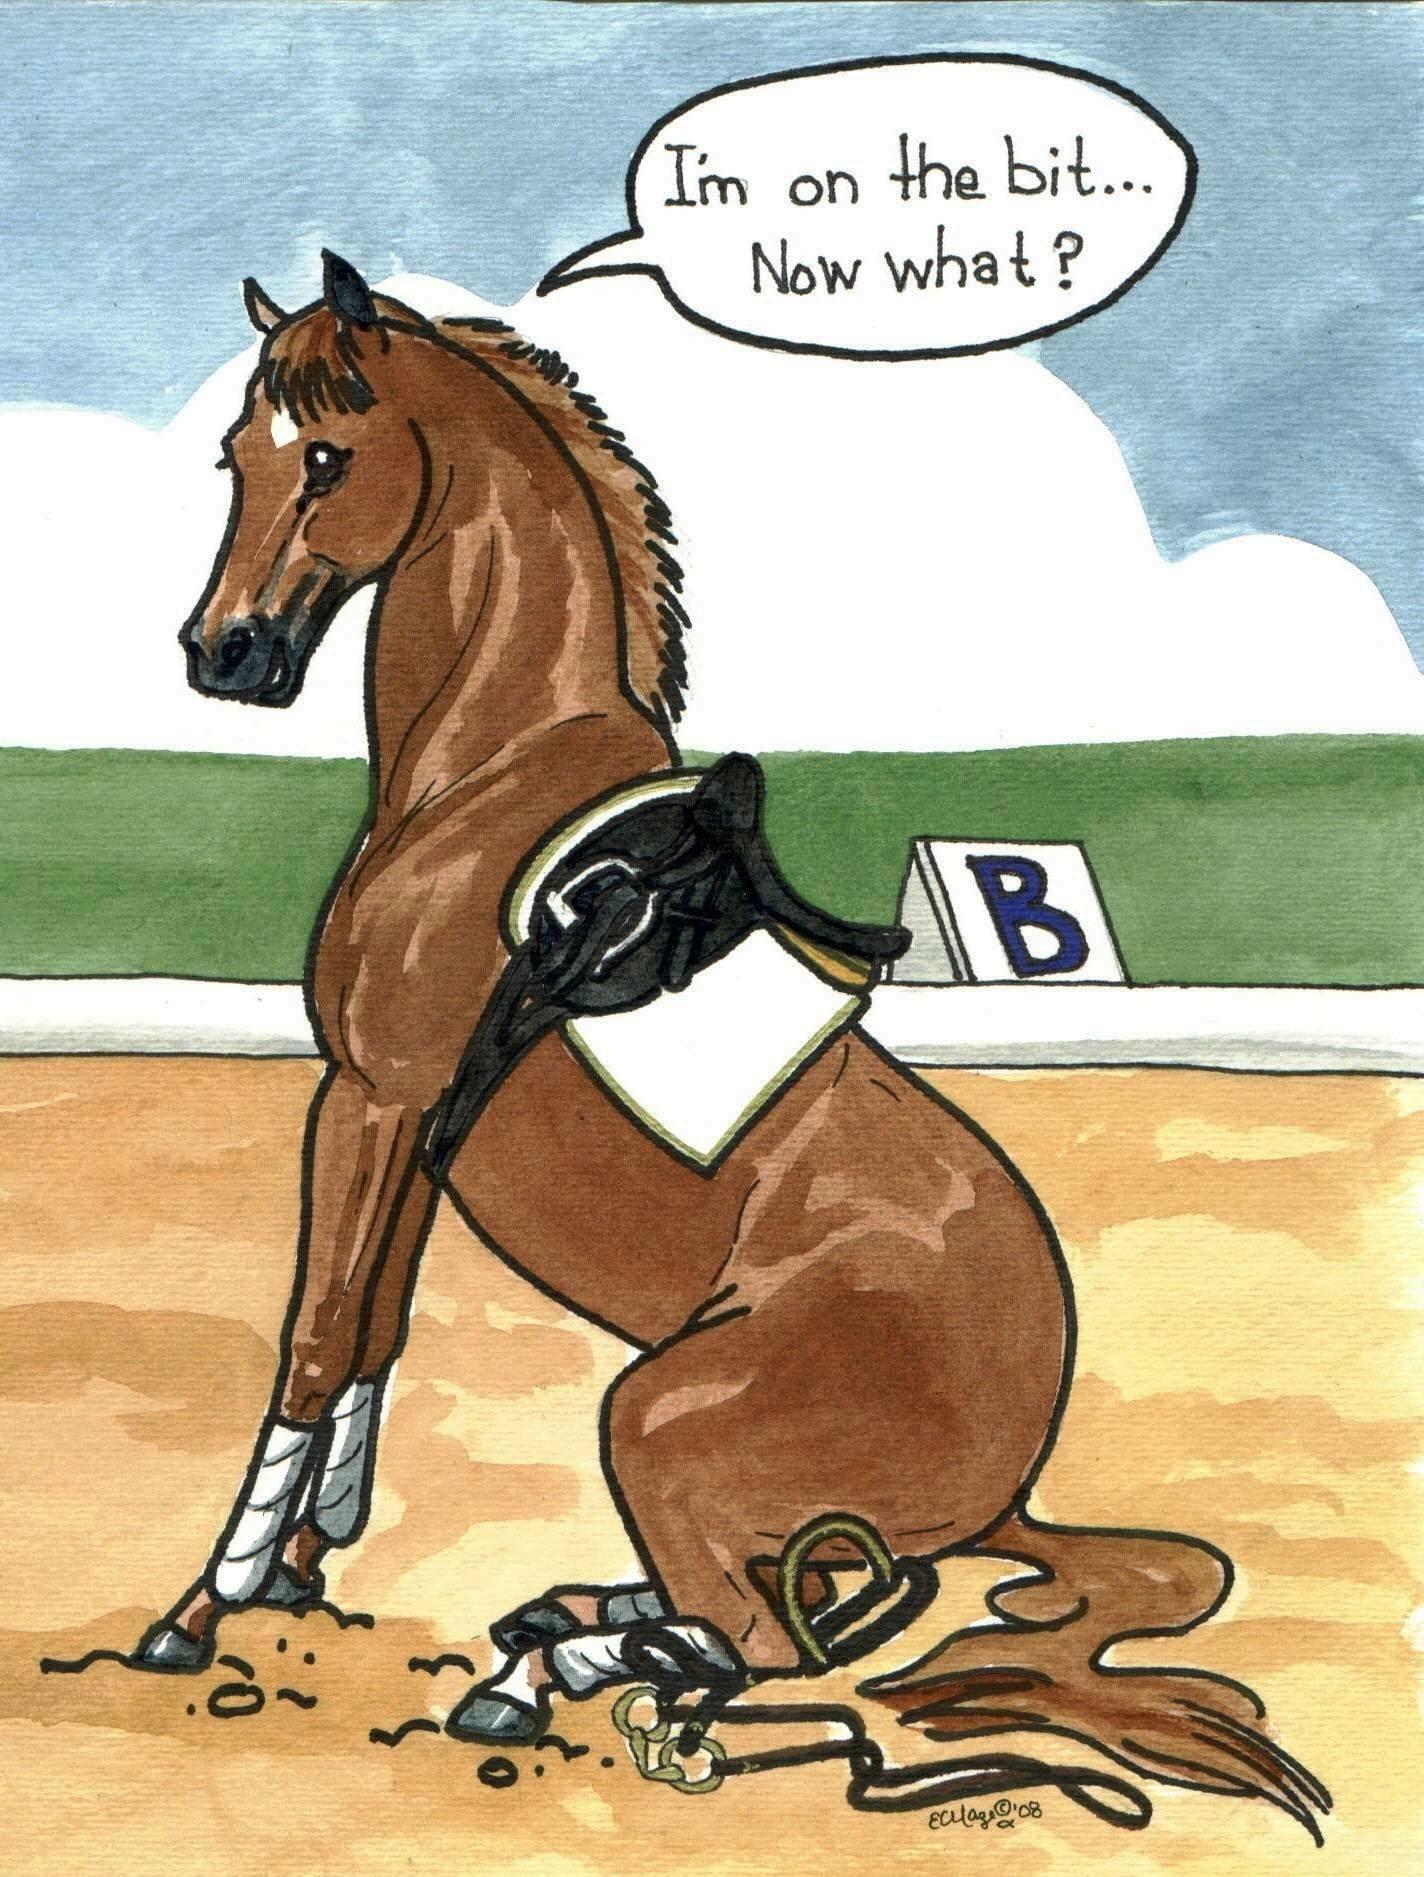 Funny horse quotes quotesgram for Where to go horseback riding near me